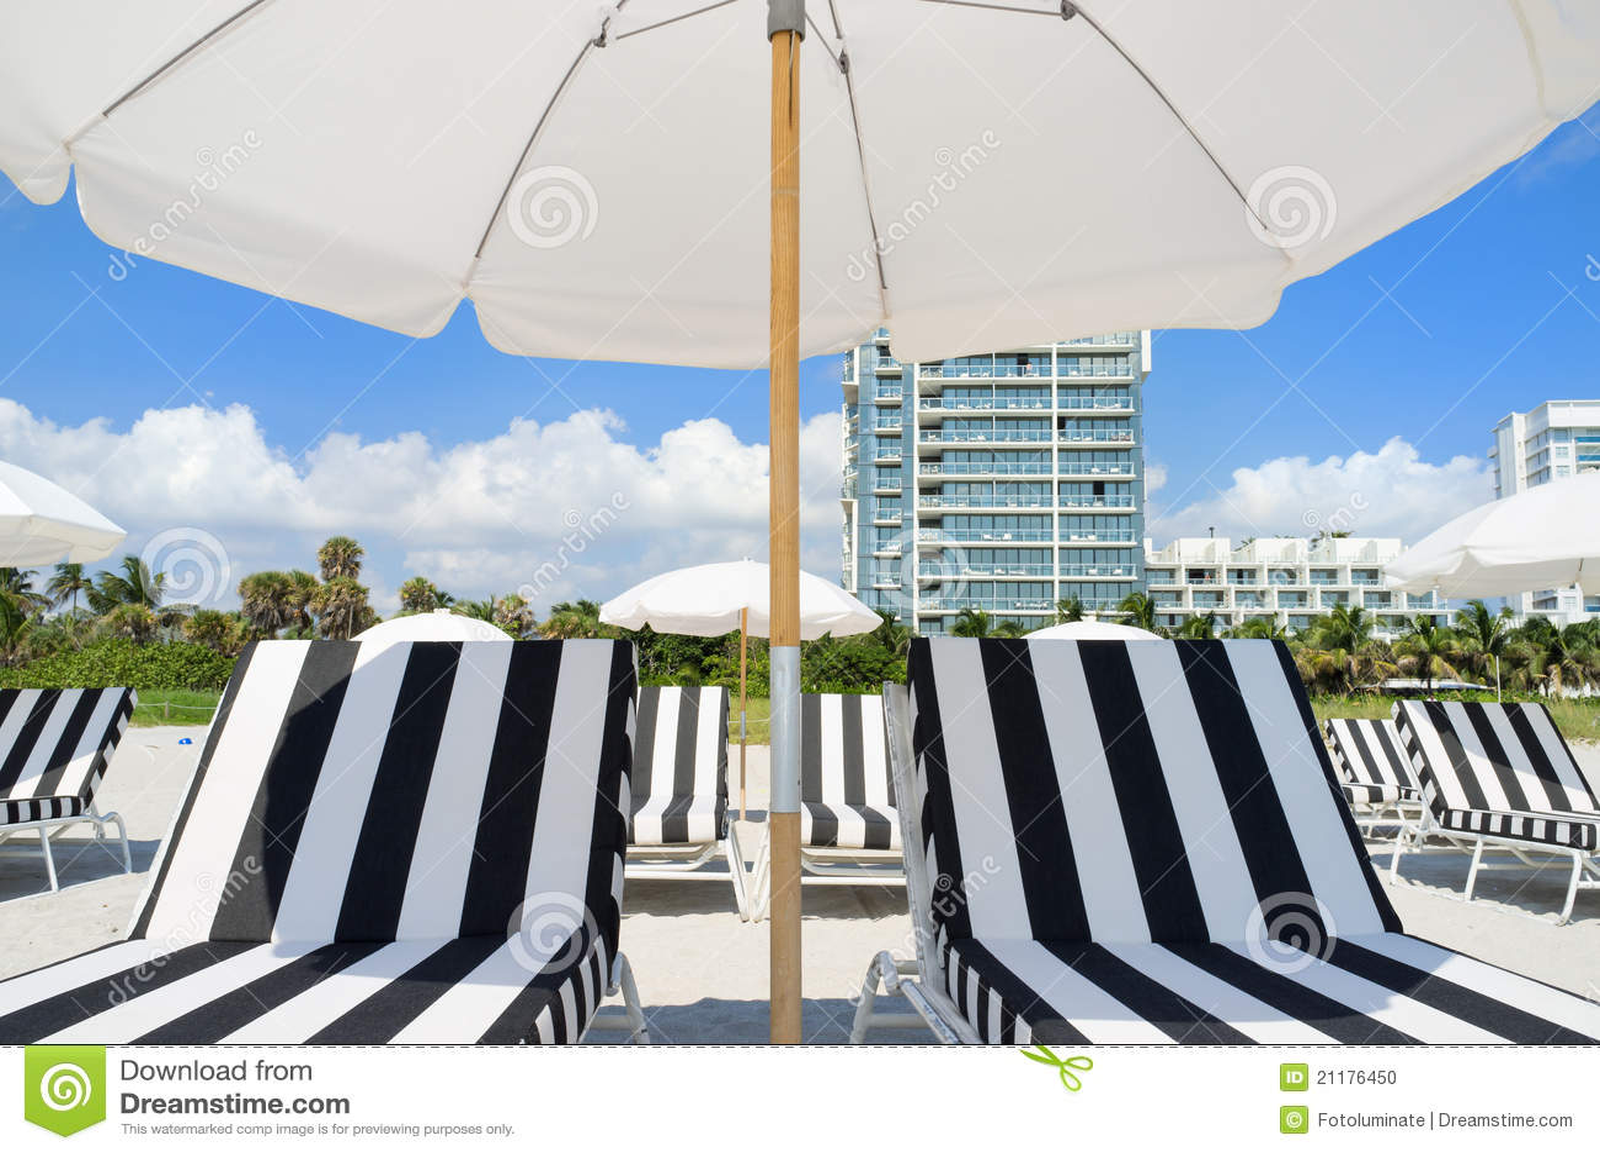 Colorful beach lounge chairs